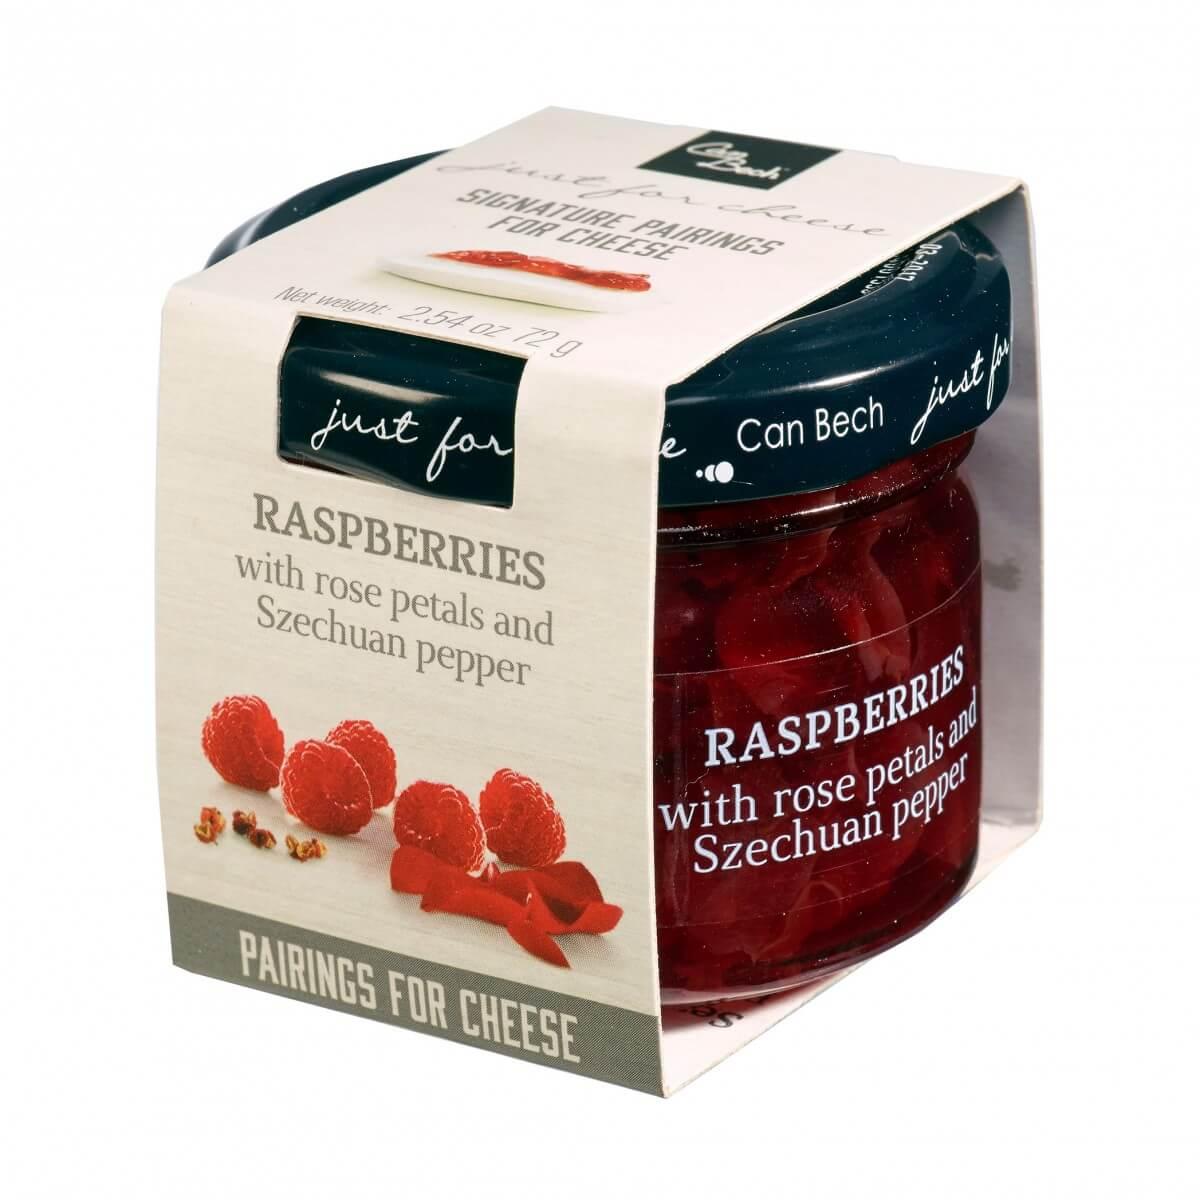 Marmelad Hallon, rosenblad, sechuan-peppar 72g